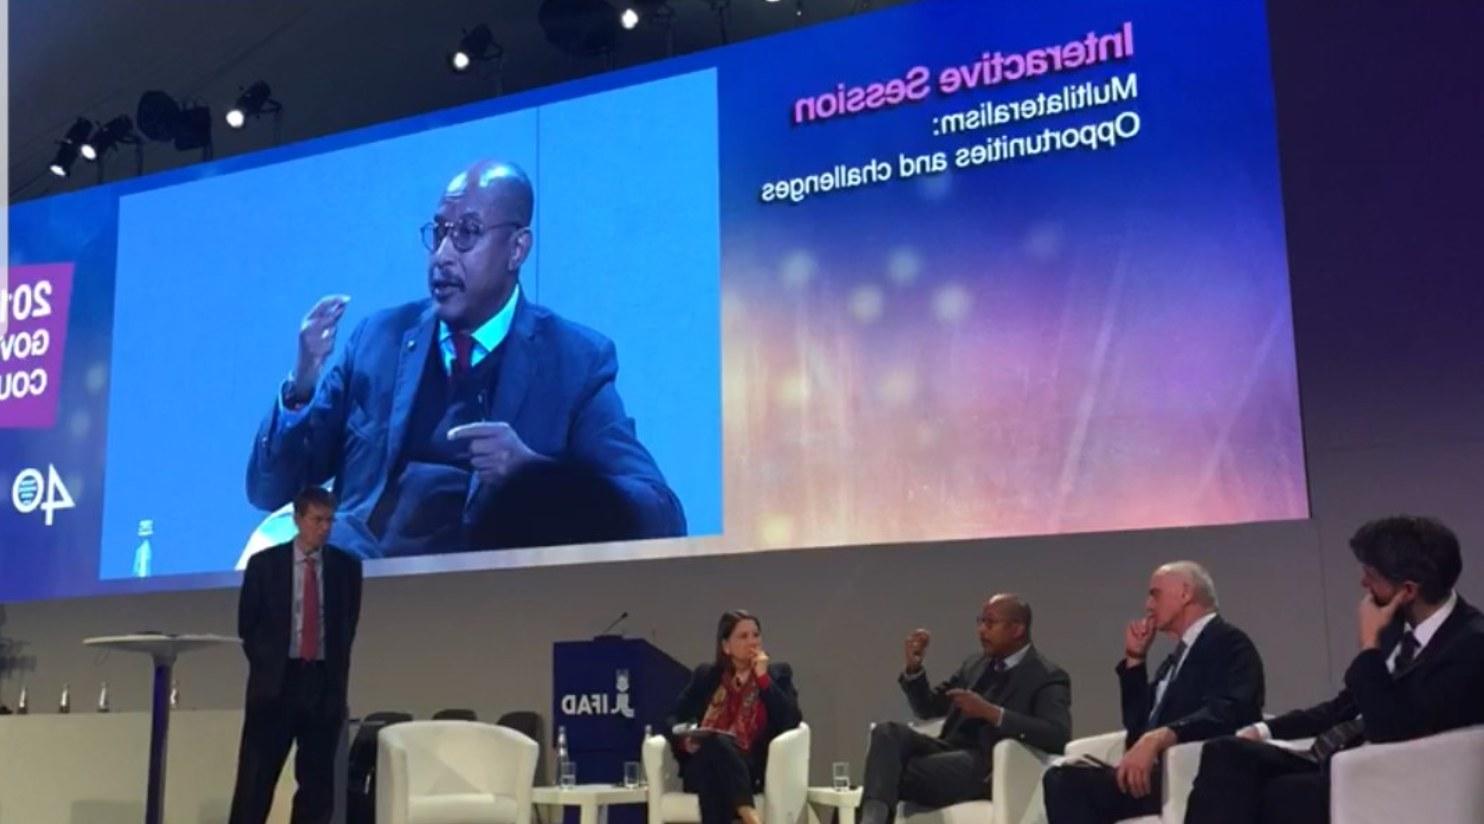 Bentuk Gaun Pengantin Muslimah Ala Princess Ffdn Multilateralism Opportunities and Challenges for Africa